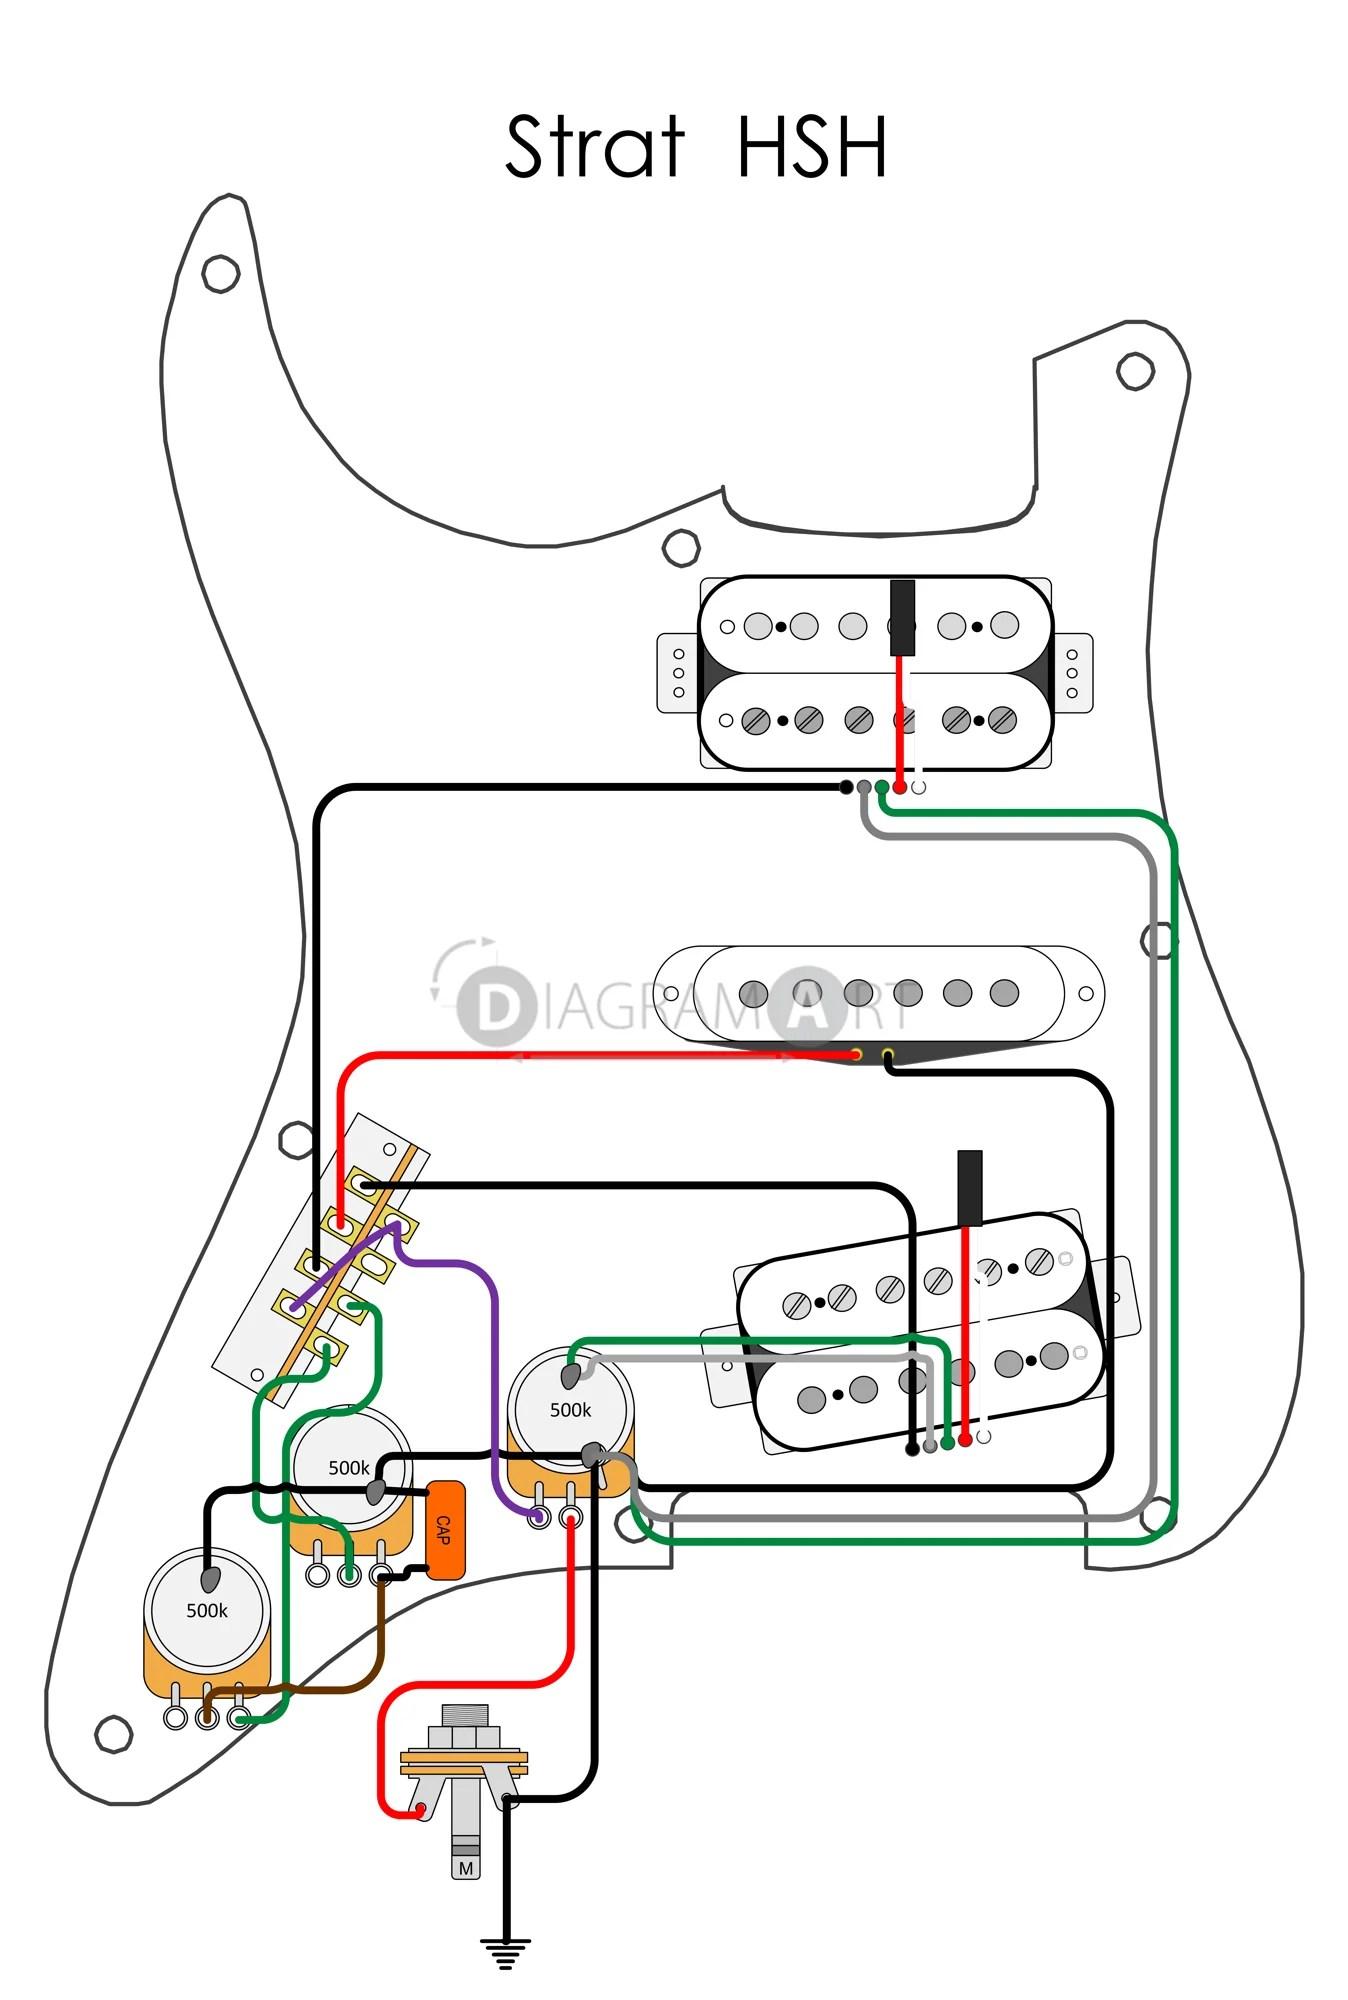 hight resolution of free download guitar wiring diagrams diagram jem simple wiring schema friendship bracelet diagrams hs wiring diagram